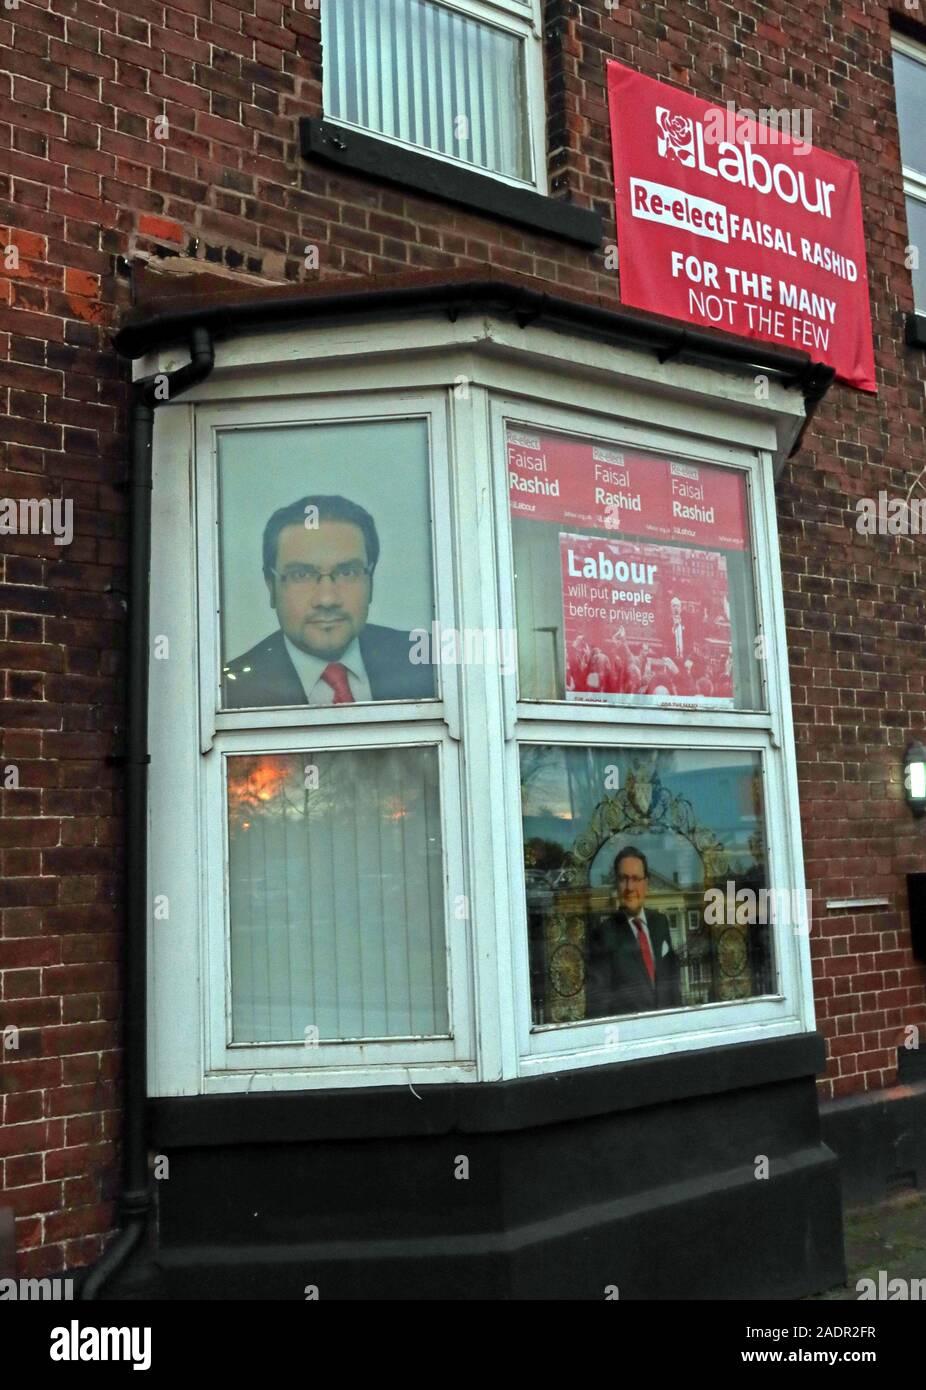 Warrington South MP Office, Re-Elect Faizal Rashid Labour Candidate General Election 2019, Cheshire, England, UK - 1 Wilson Patten St, WA1 1PG Stock Photo